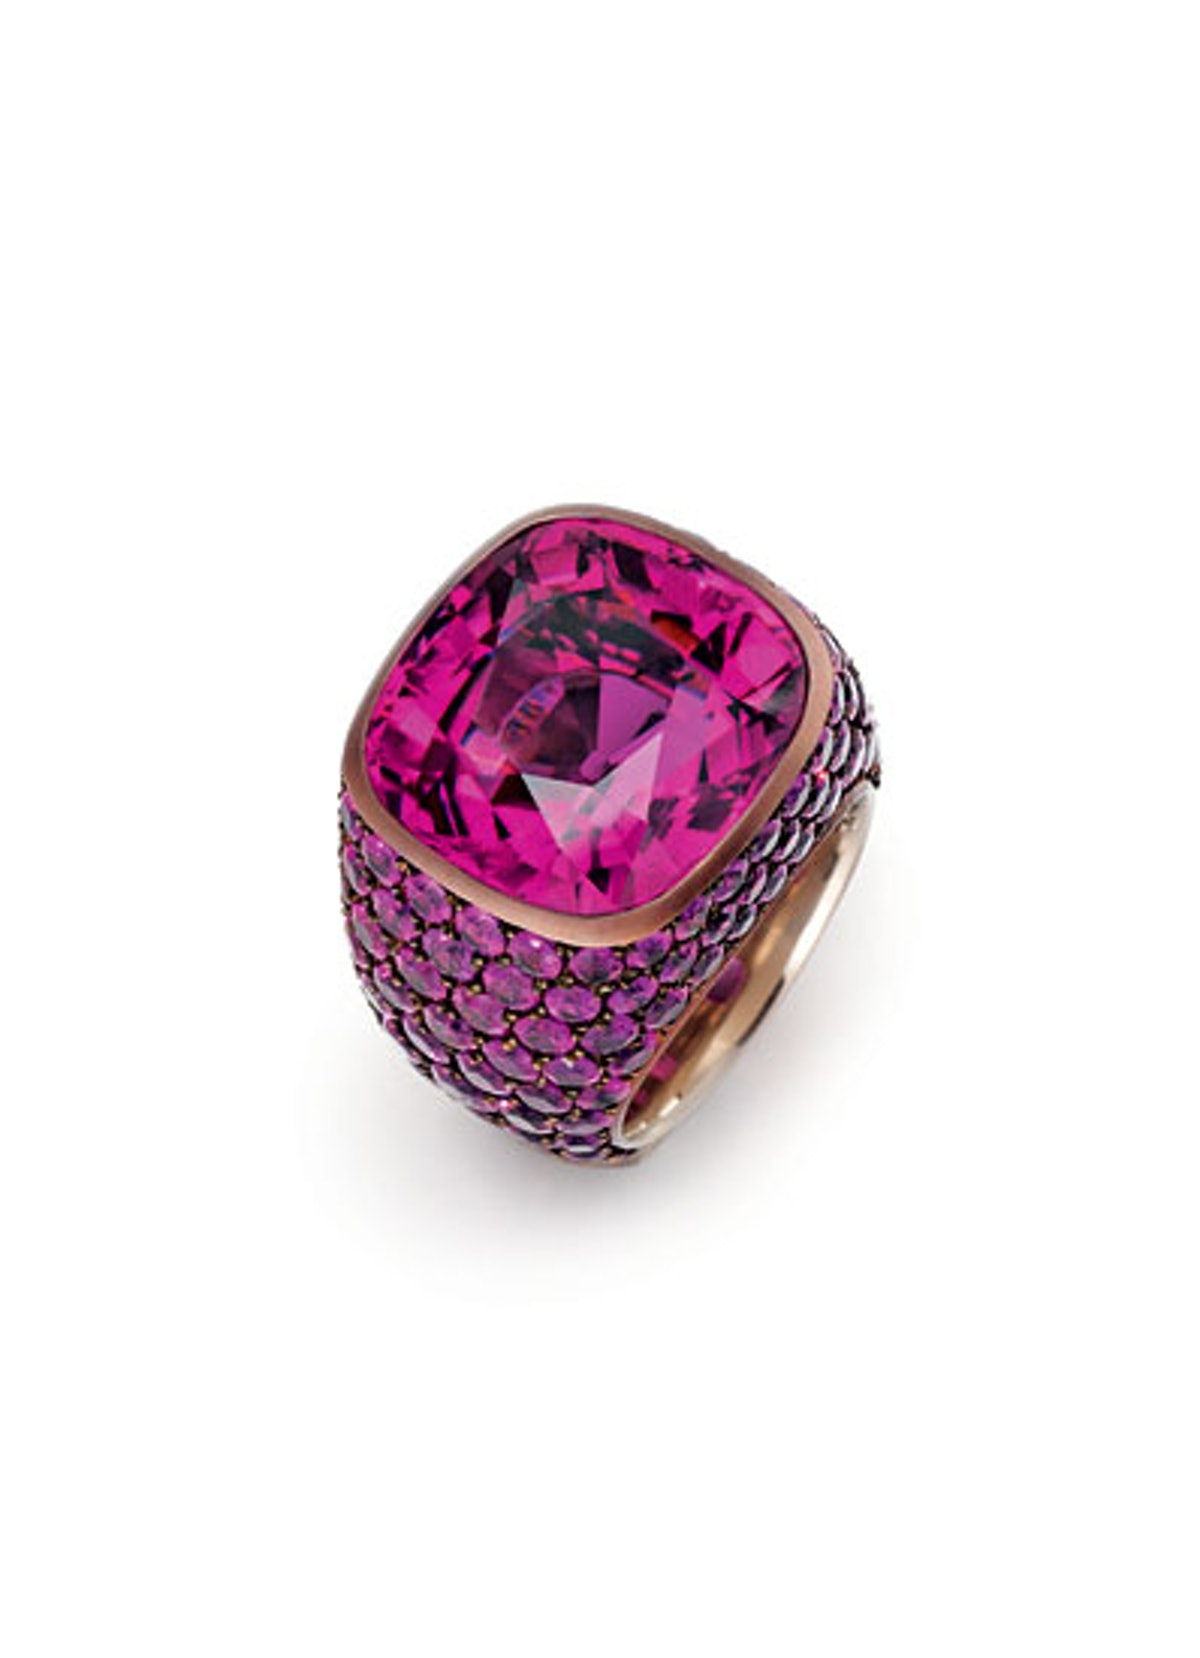 acss-golden-globes-jewelry-06-v.jpg